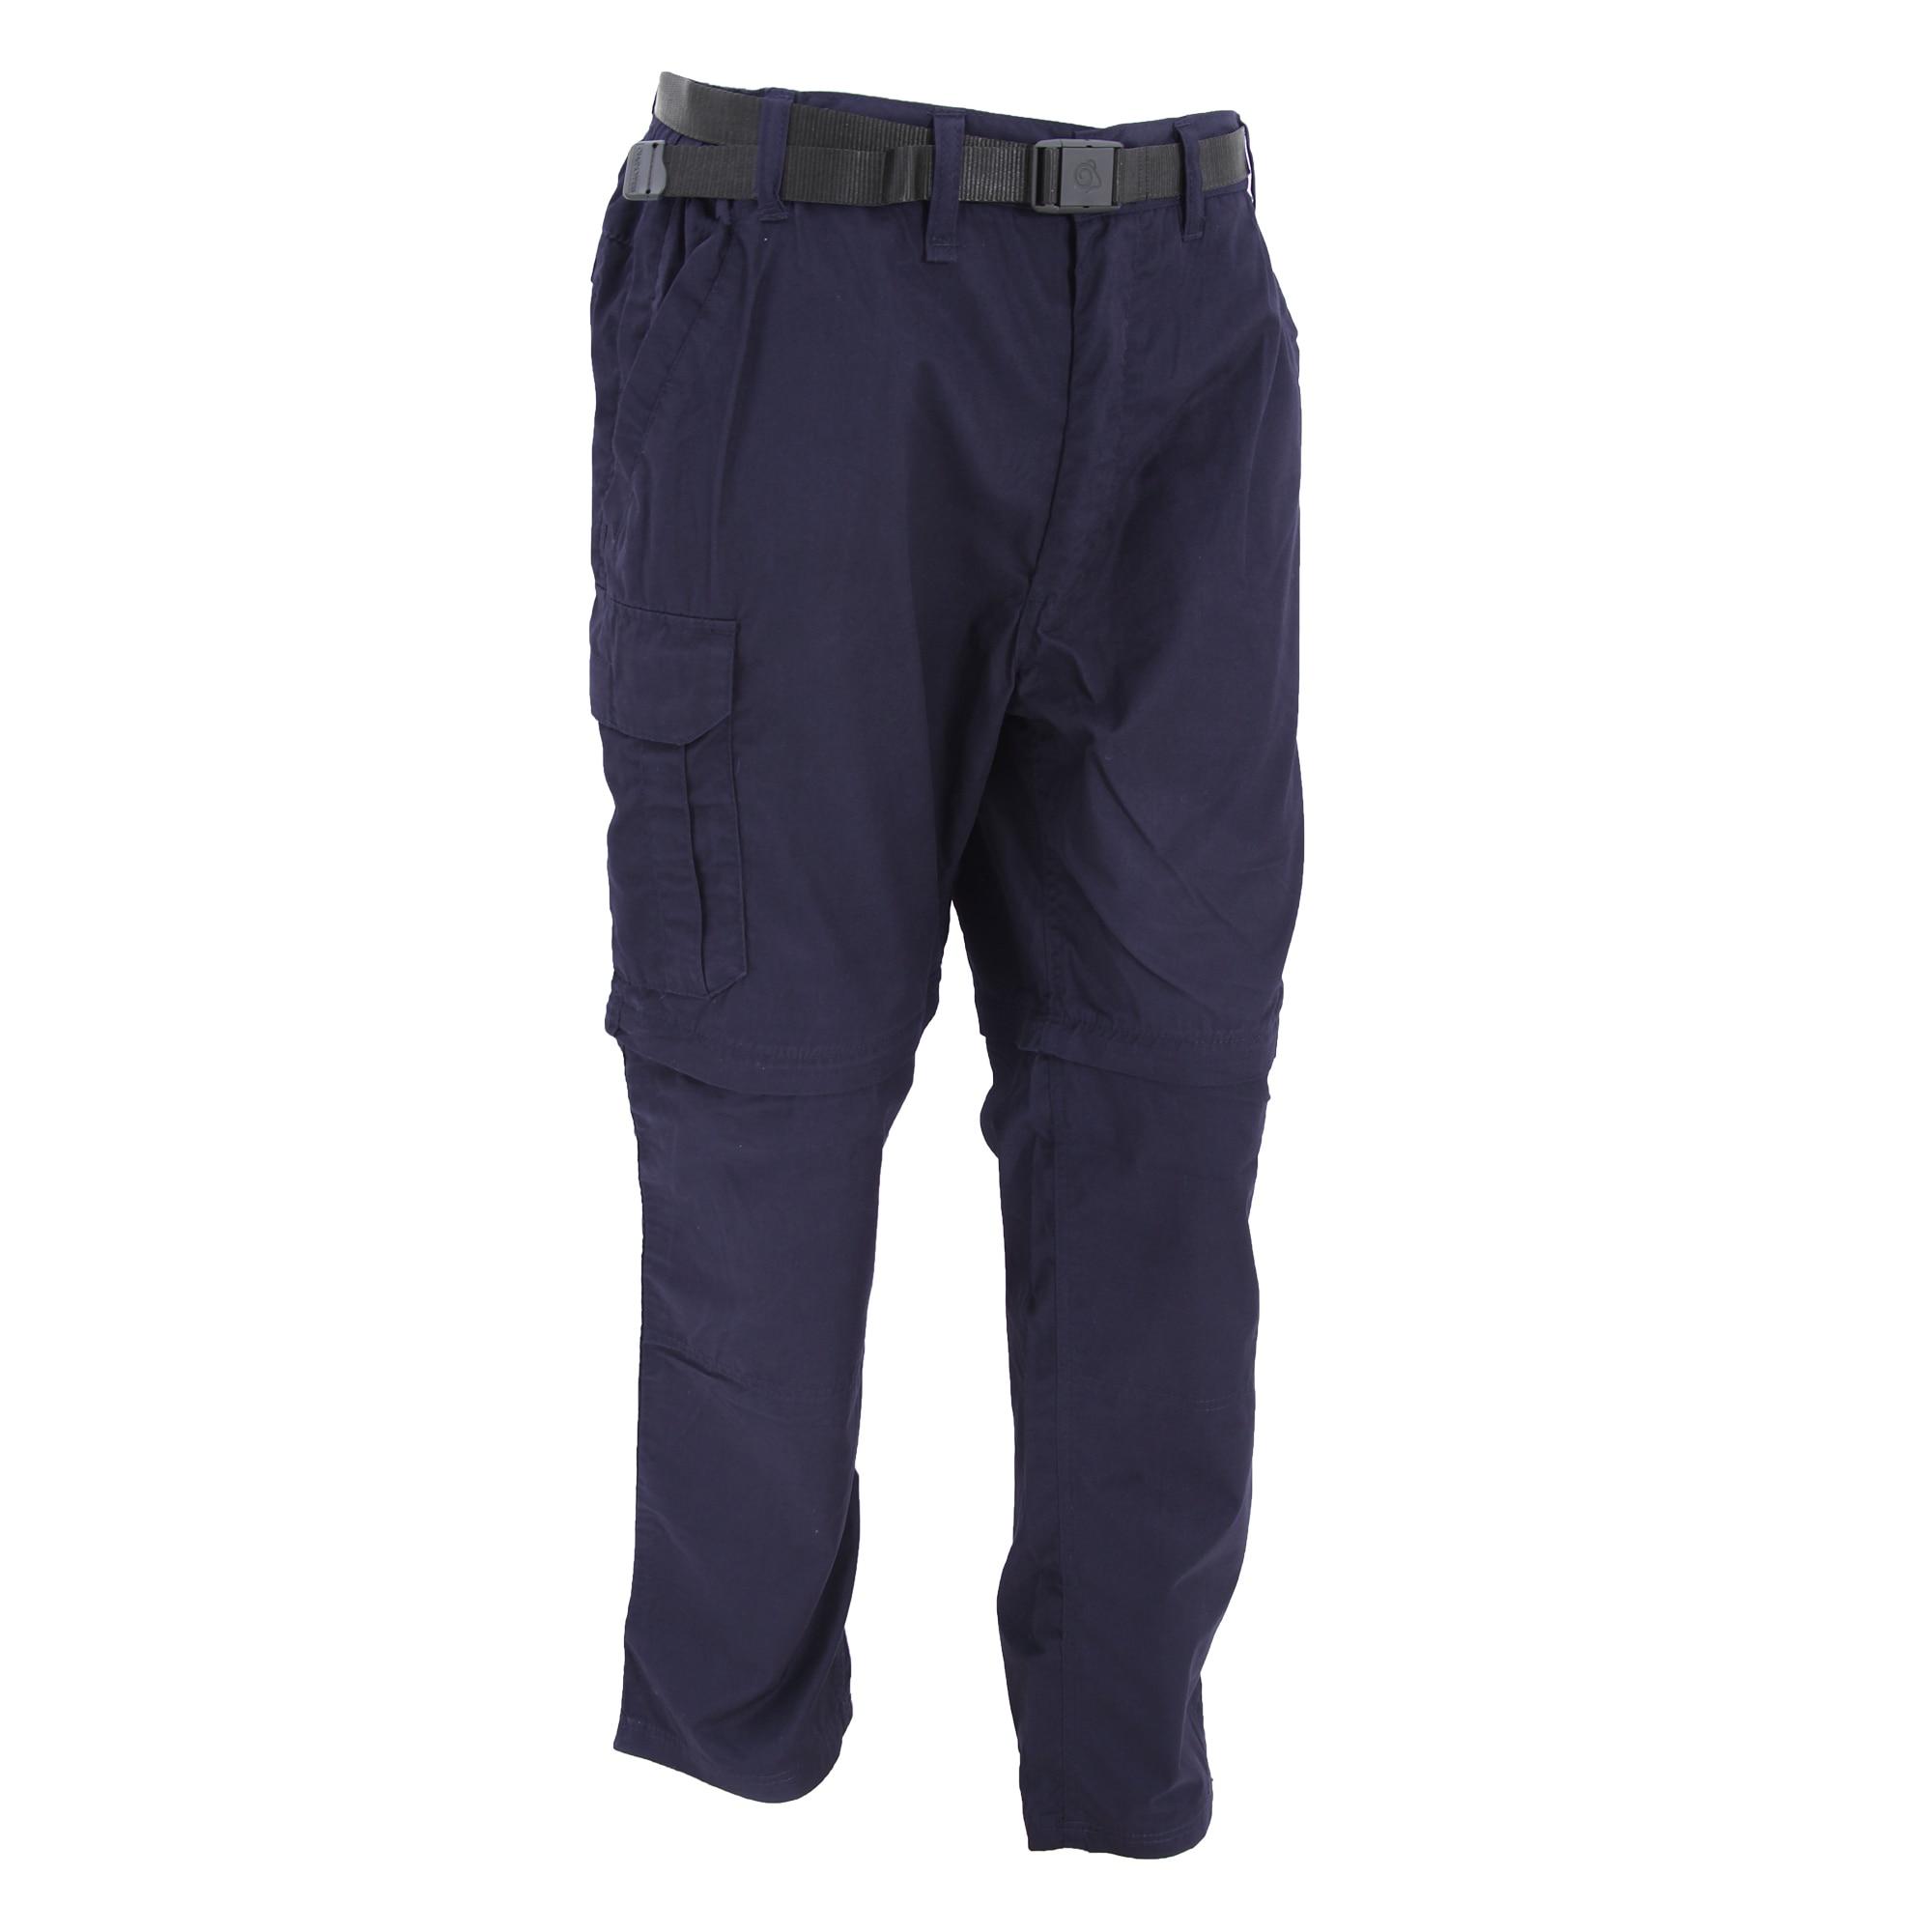 Craghoppers Cargohose Herren Hose SmartDry Nano   Bekleidung > Hosen > Cargohosen   Blau   Polyester - Baumwolle   Craghoppers